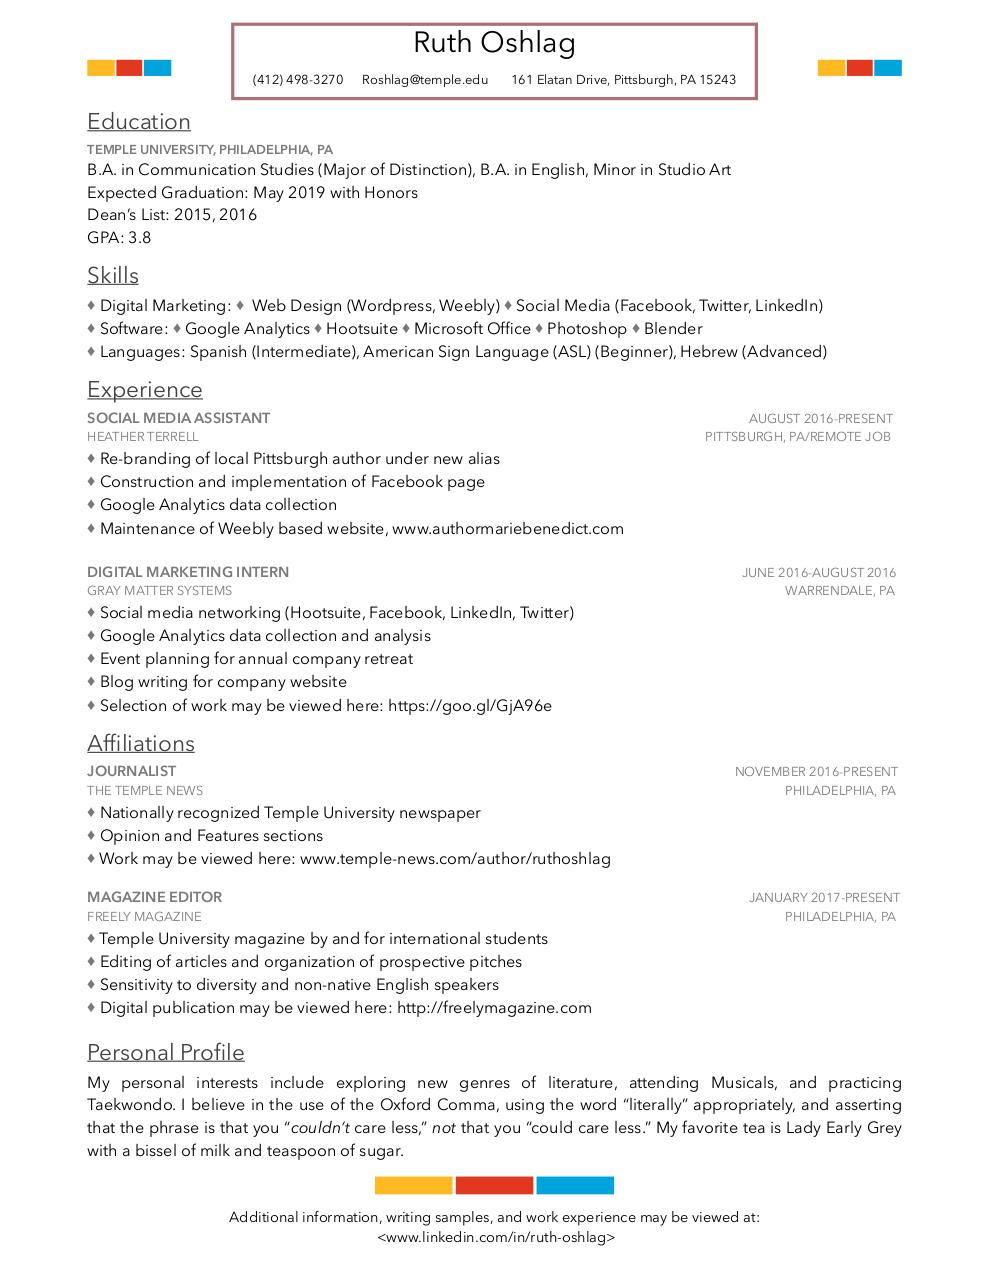 resume using qr code